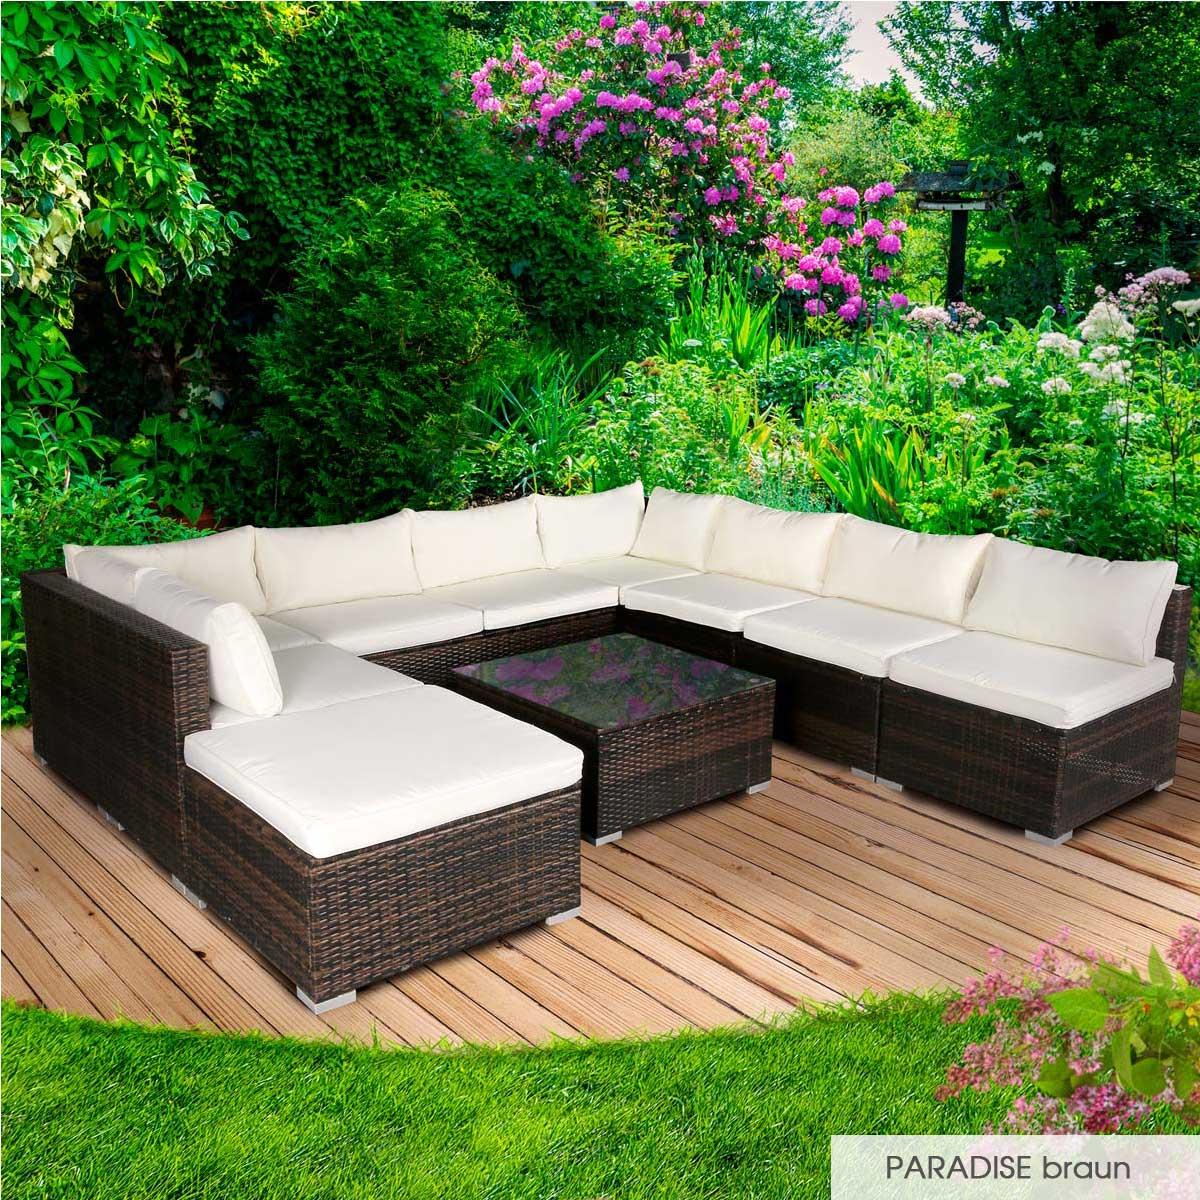 Gartenmoebel-Poly-Rattan-Lounge-Moebel-Sitzgarnitur-Gartengarnitur-Sitzgruppe-Sofa Indexbild 38